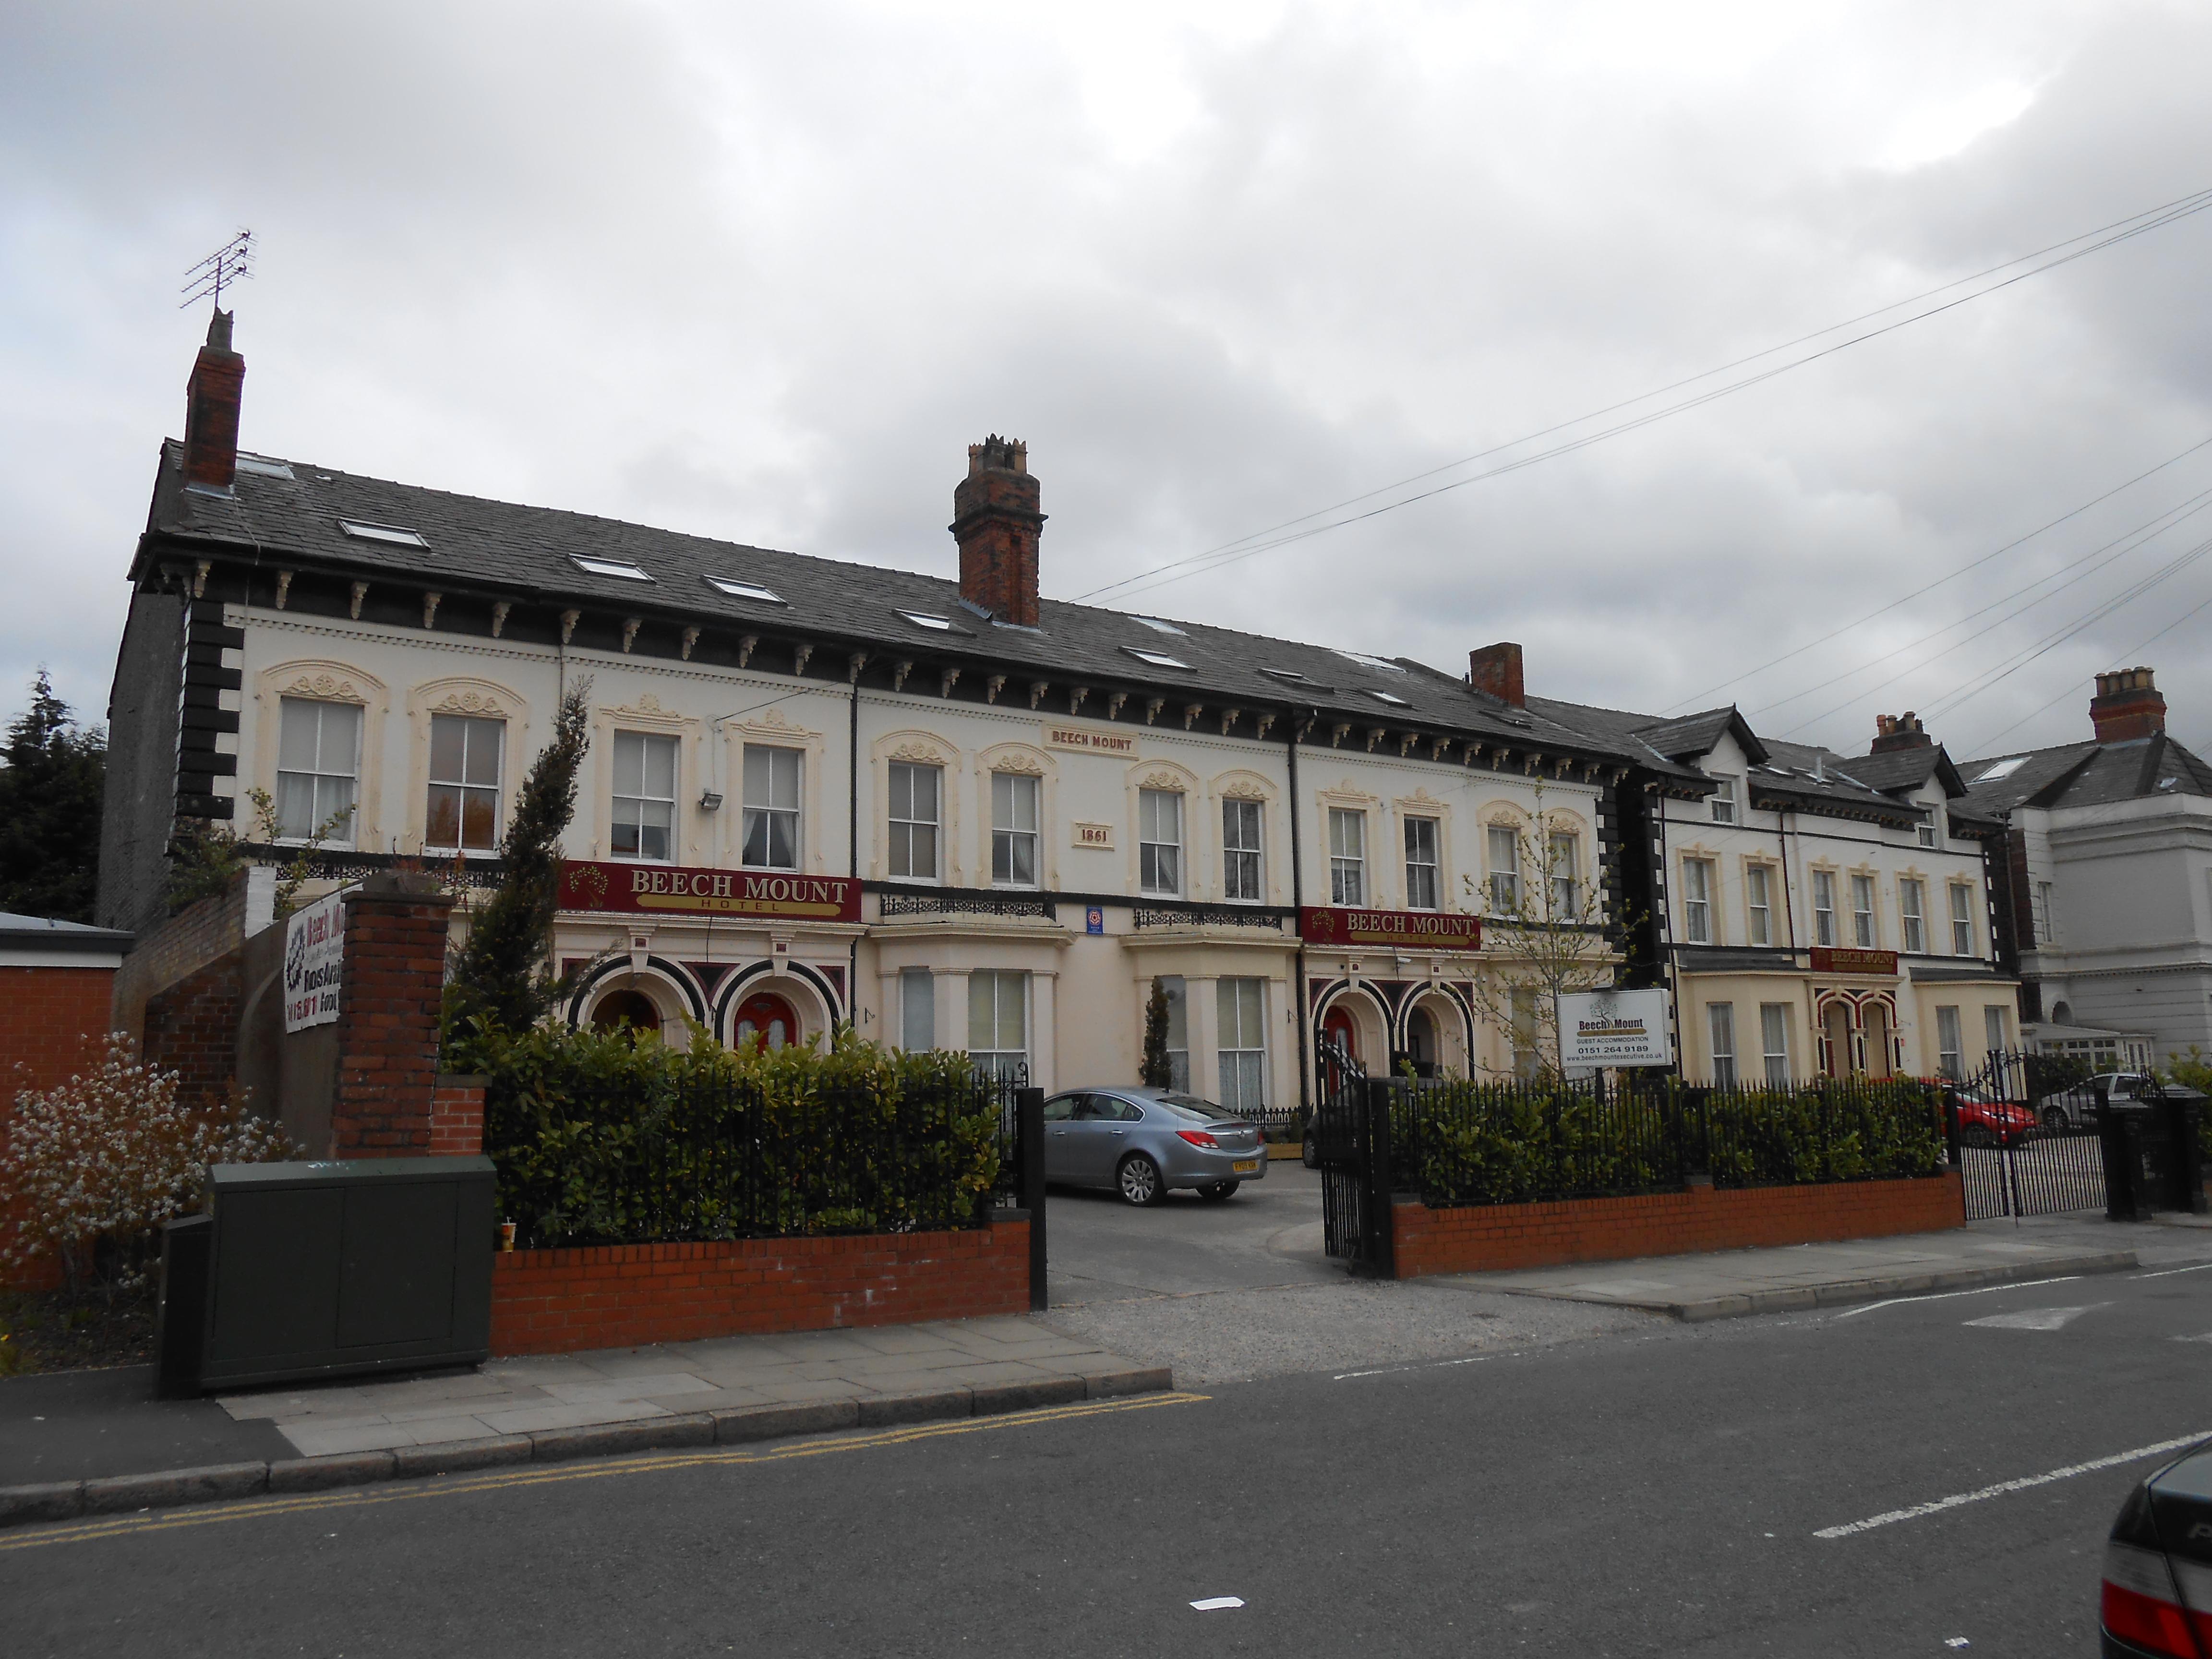 Filebeech Mount Hotel Liverpool Jpg